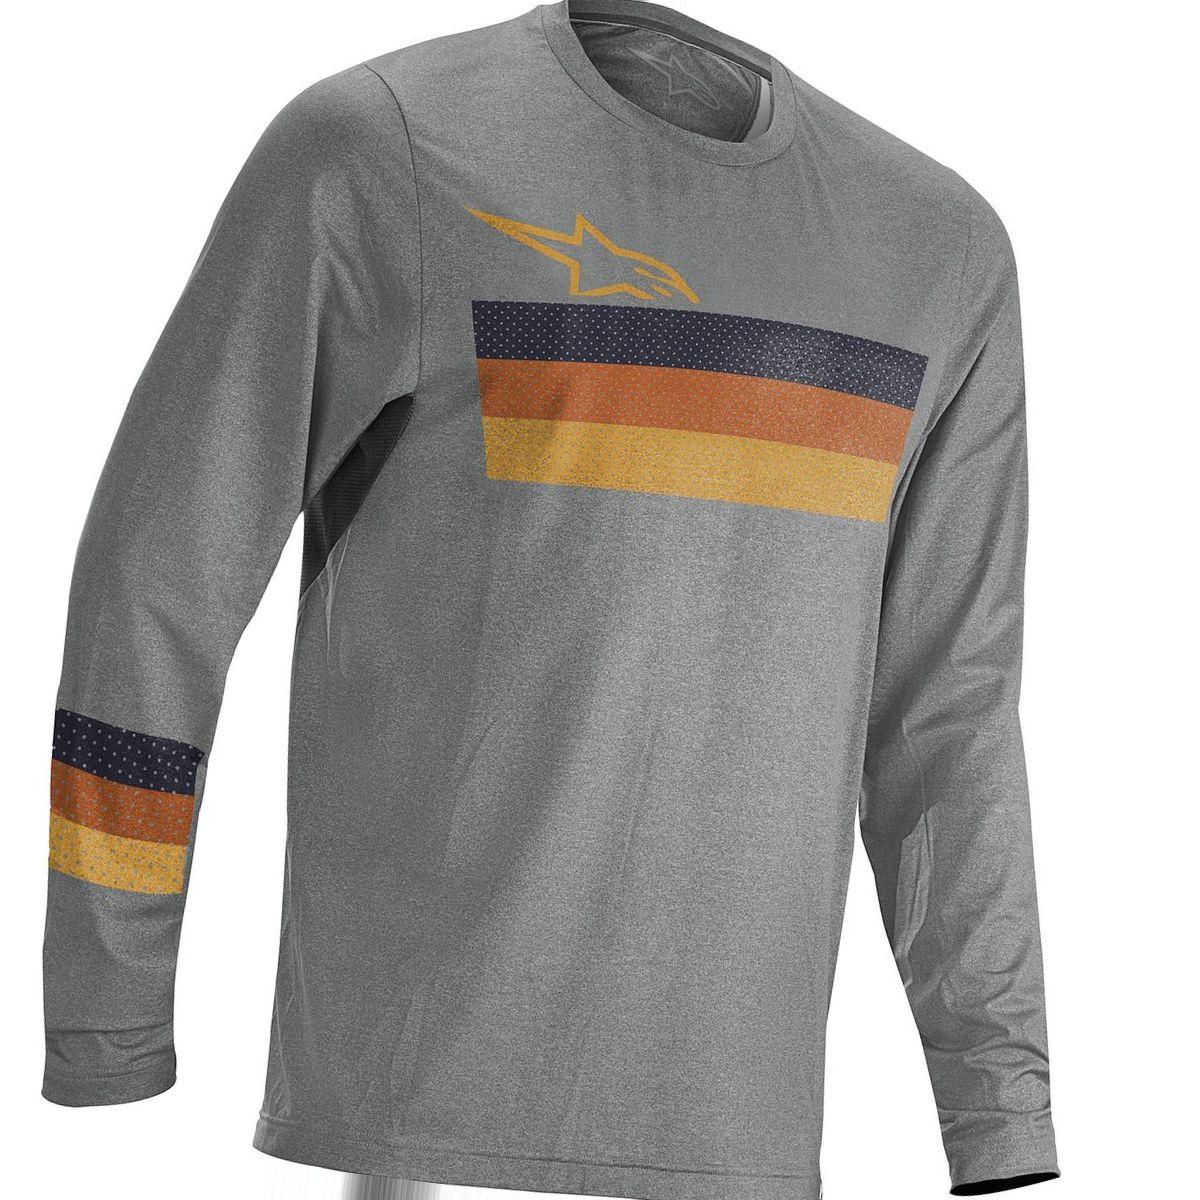 Alpinestars Alps 6.0 Long-Sleeve Jersey - Men's